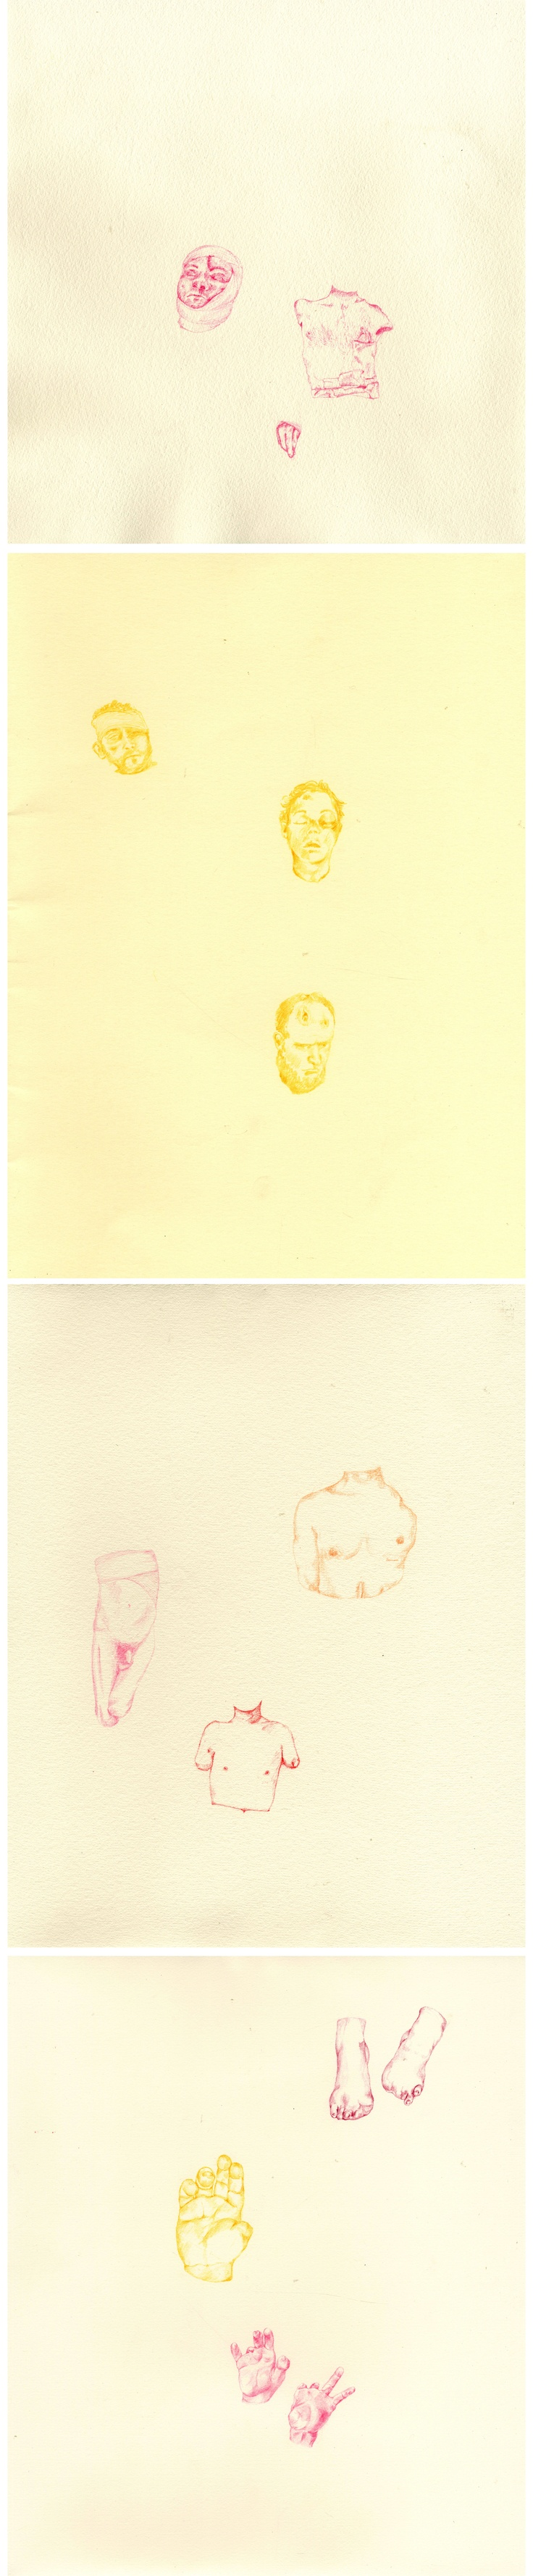 War Hero I, II, III, IV Colouring pencil on paper, Eleanor Phillips, 2013 http://eleanorphillips.wordpress.com/